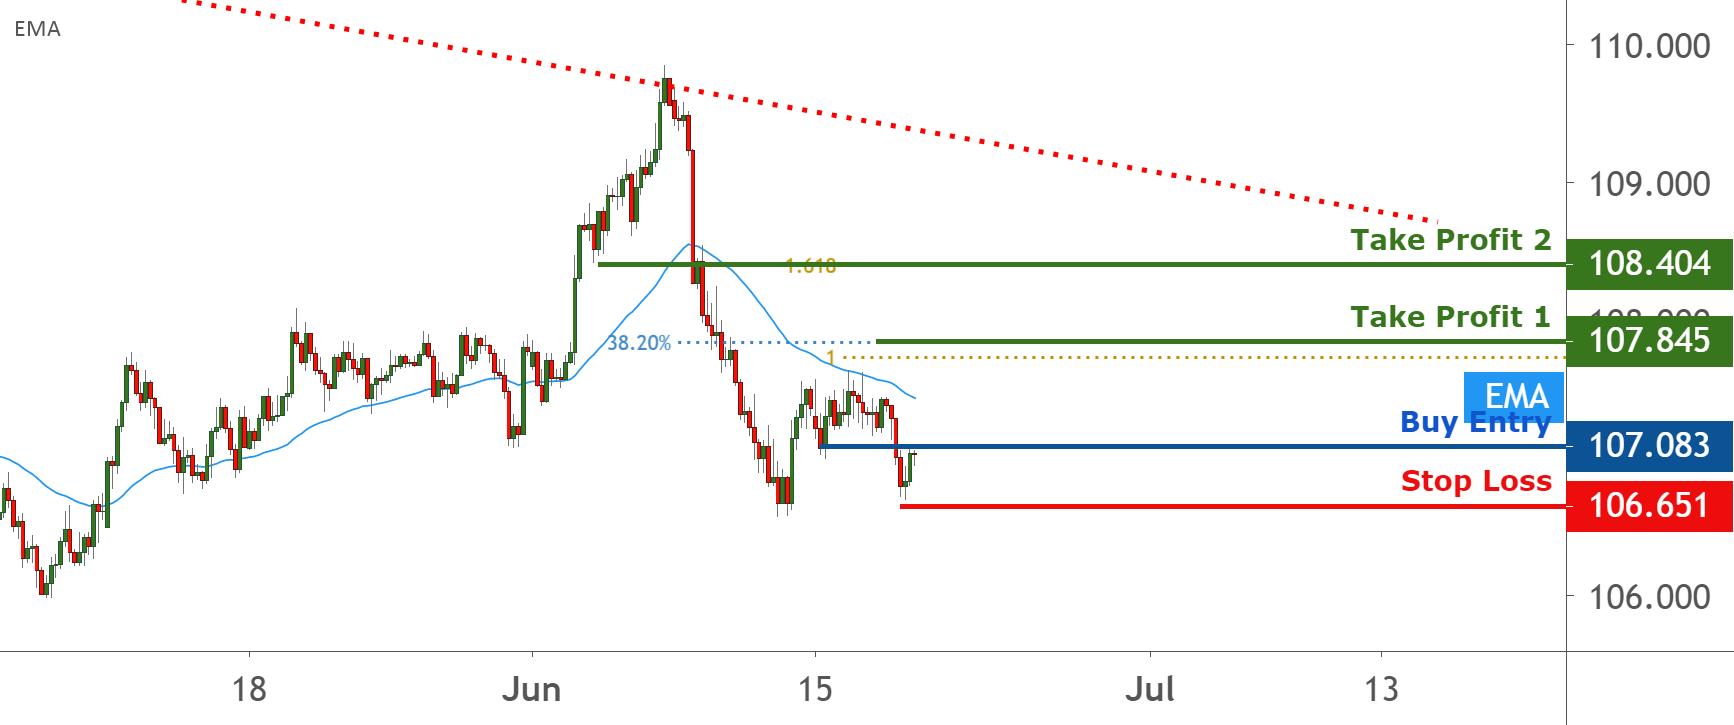 USDJPY on a double bottom, possible bounce | 18 June 2020 for FX:USDJPY by FXCM